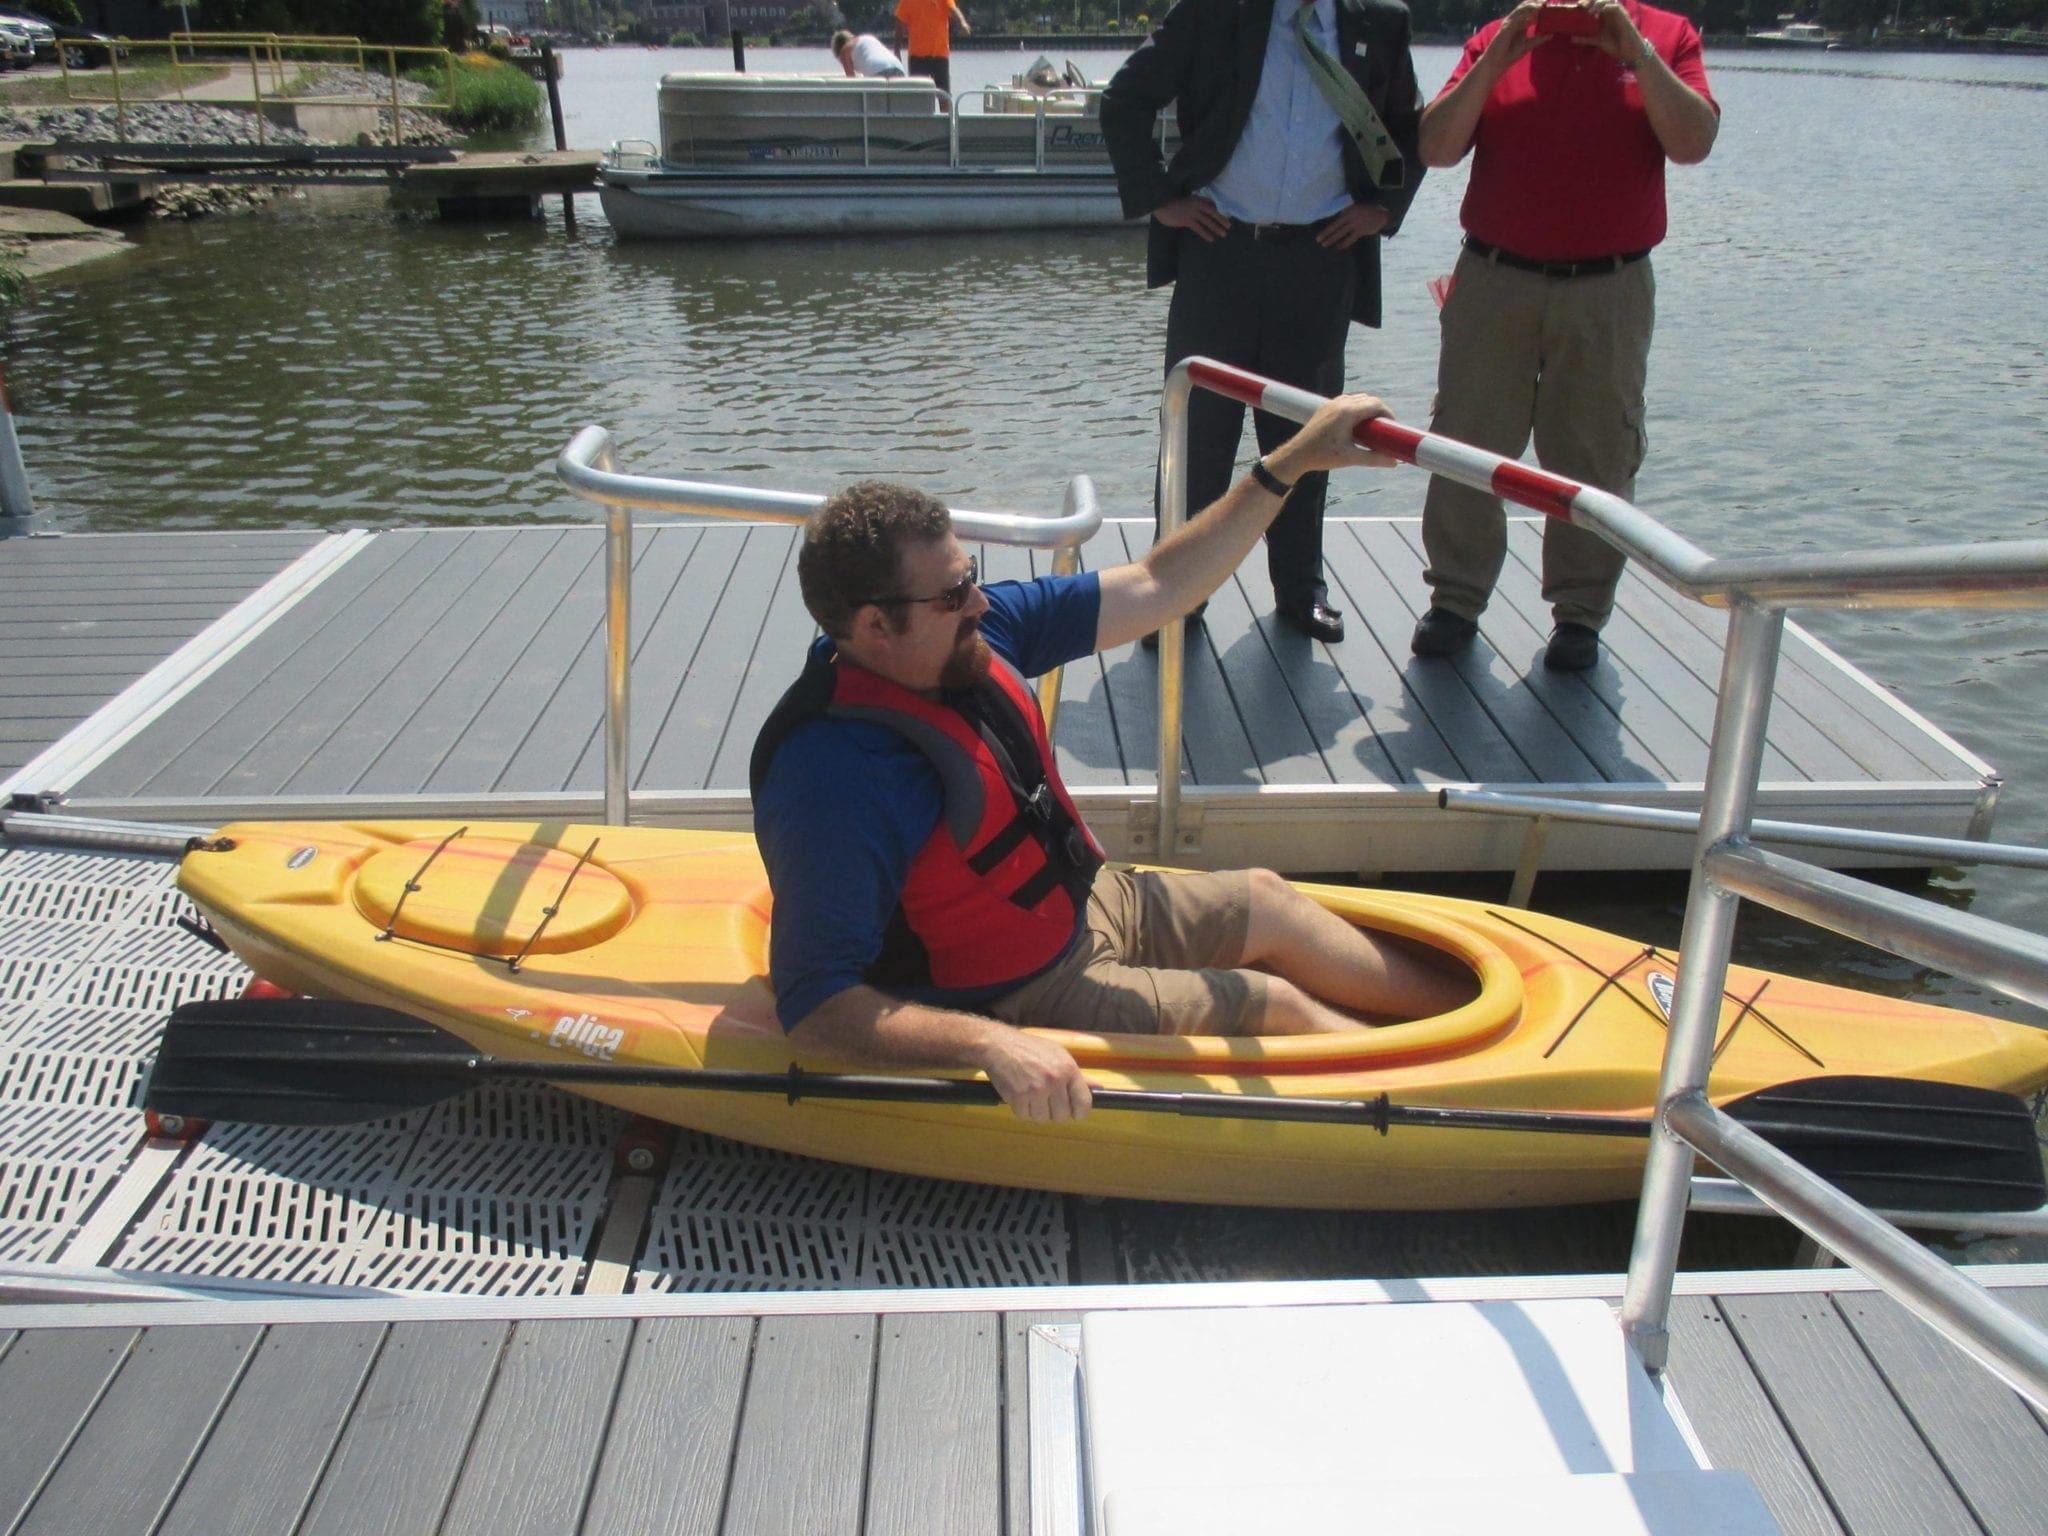 Paddle away: B'ville officially opens Mercer Park kayak launch